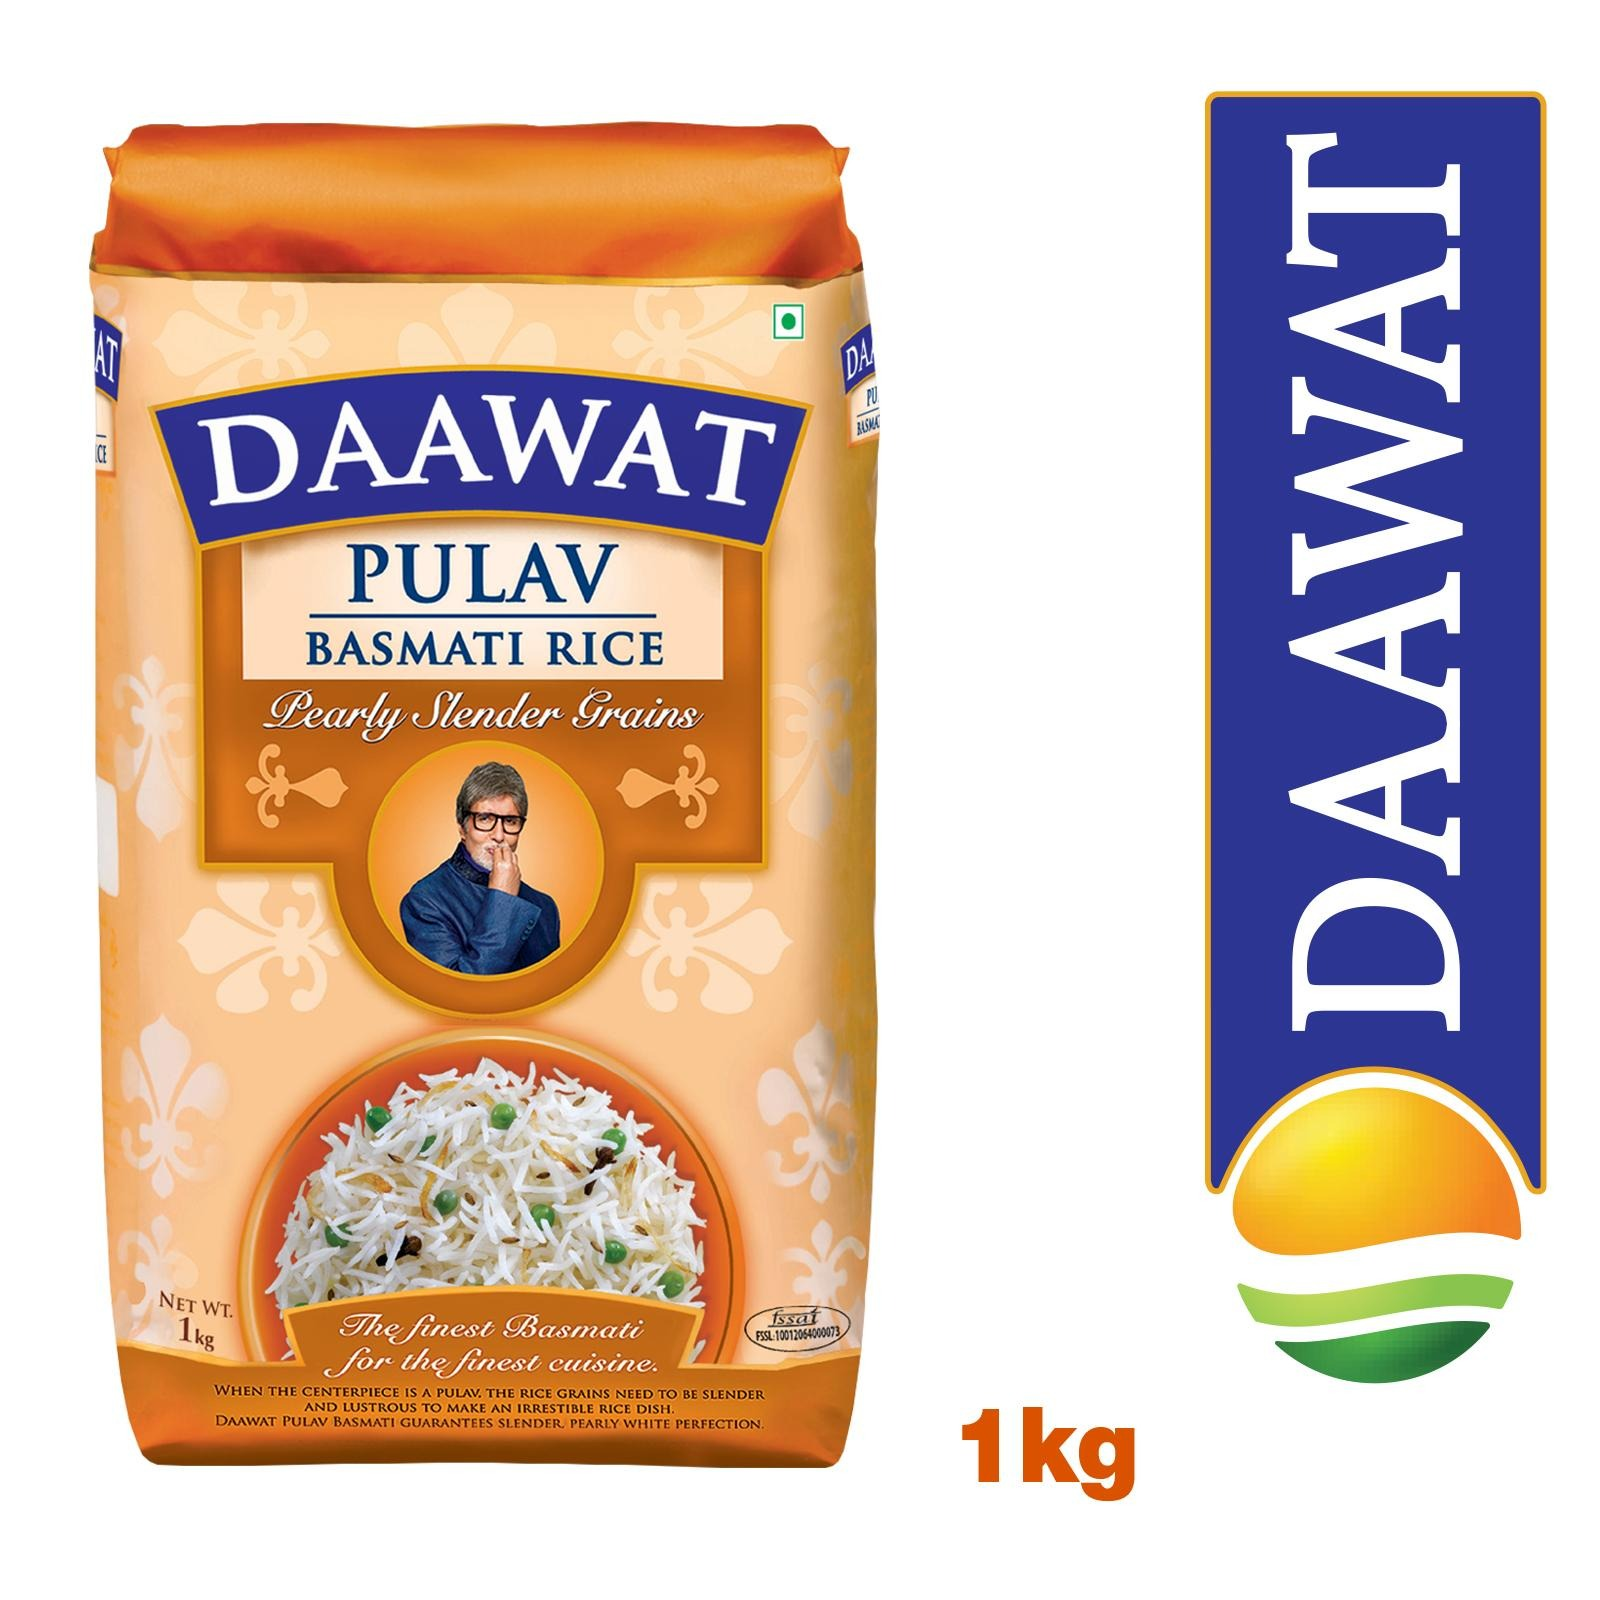 Daawat Pulav Basmati Rice - By Sonnamera